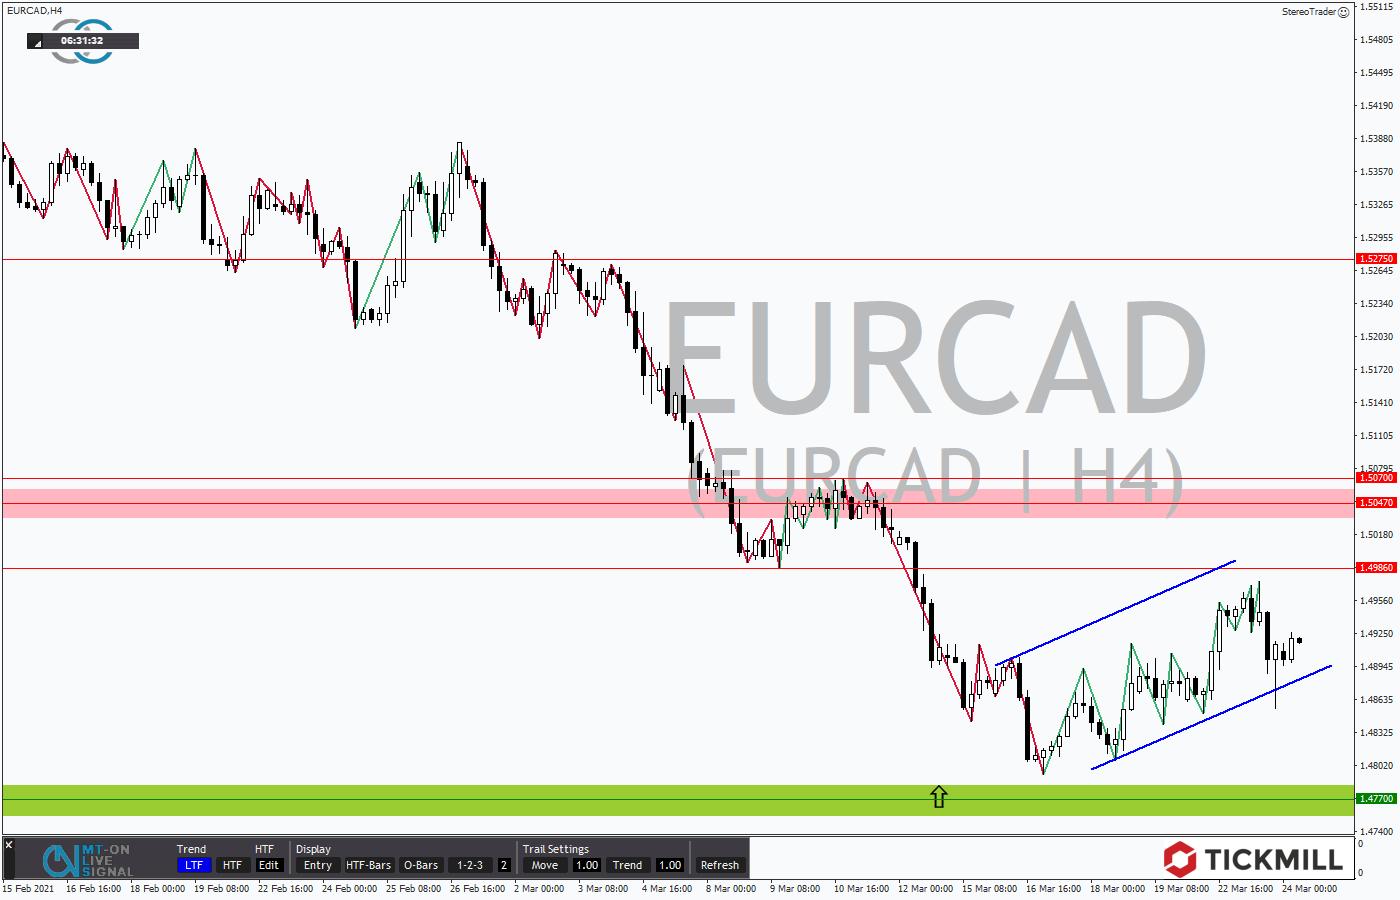 Tickmill-Analyse: EURCAD im4-Stundenchart